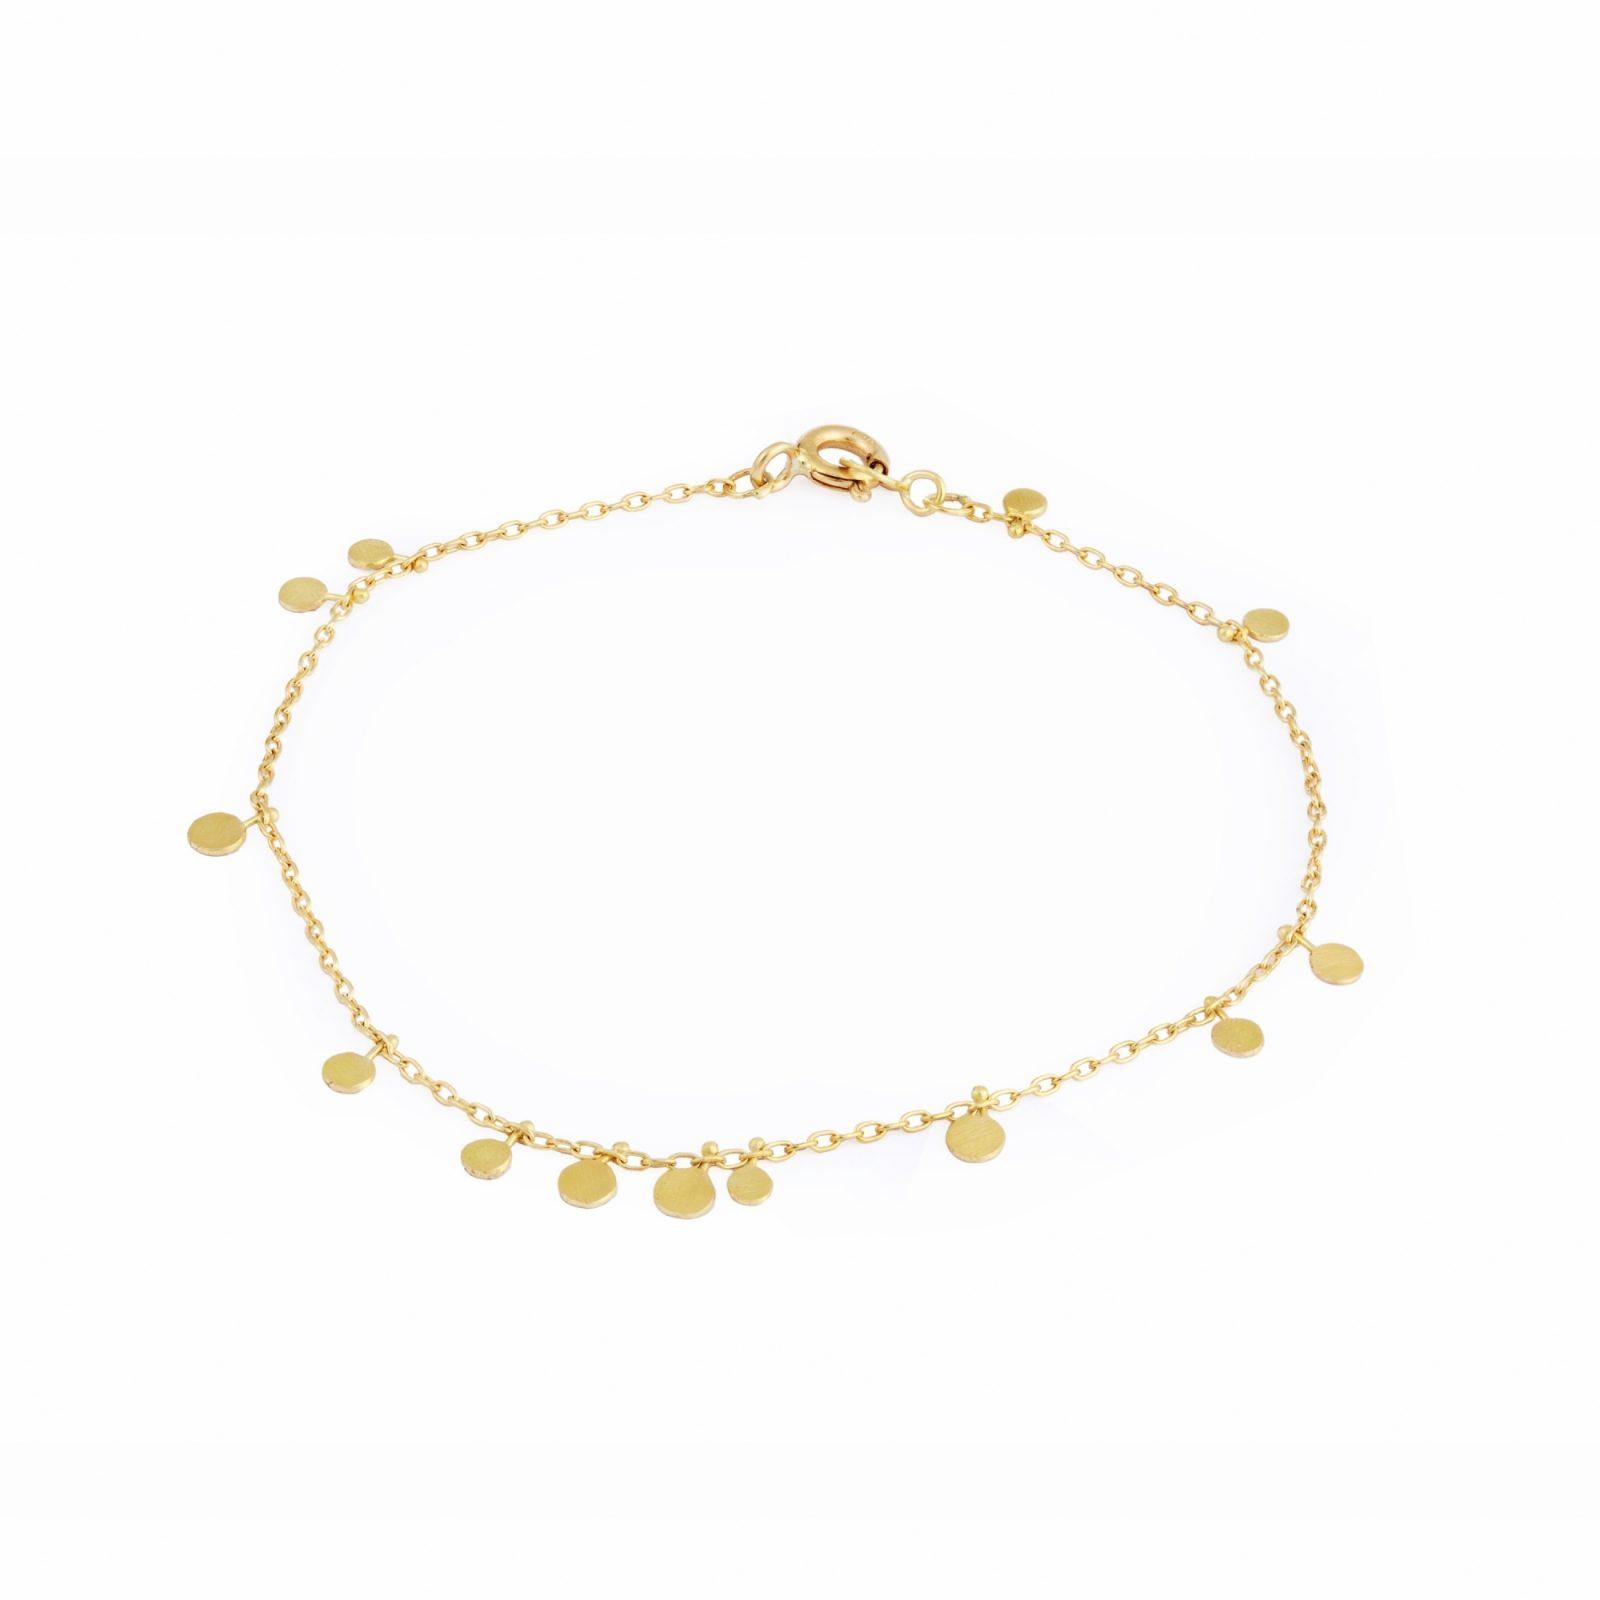 Sia Taylor DB3 Y Little Random Yellow Gold Dots Bracelets WB